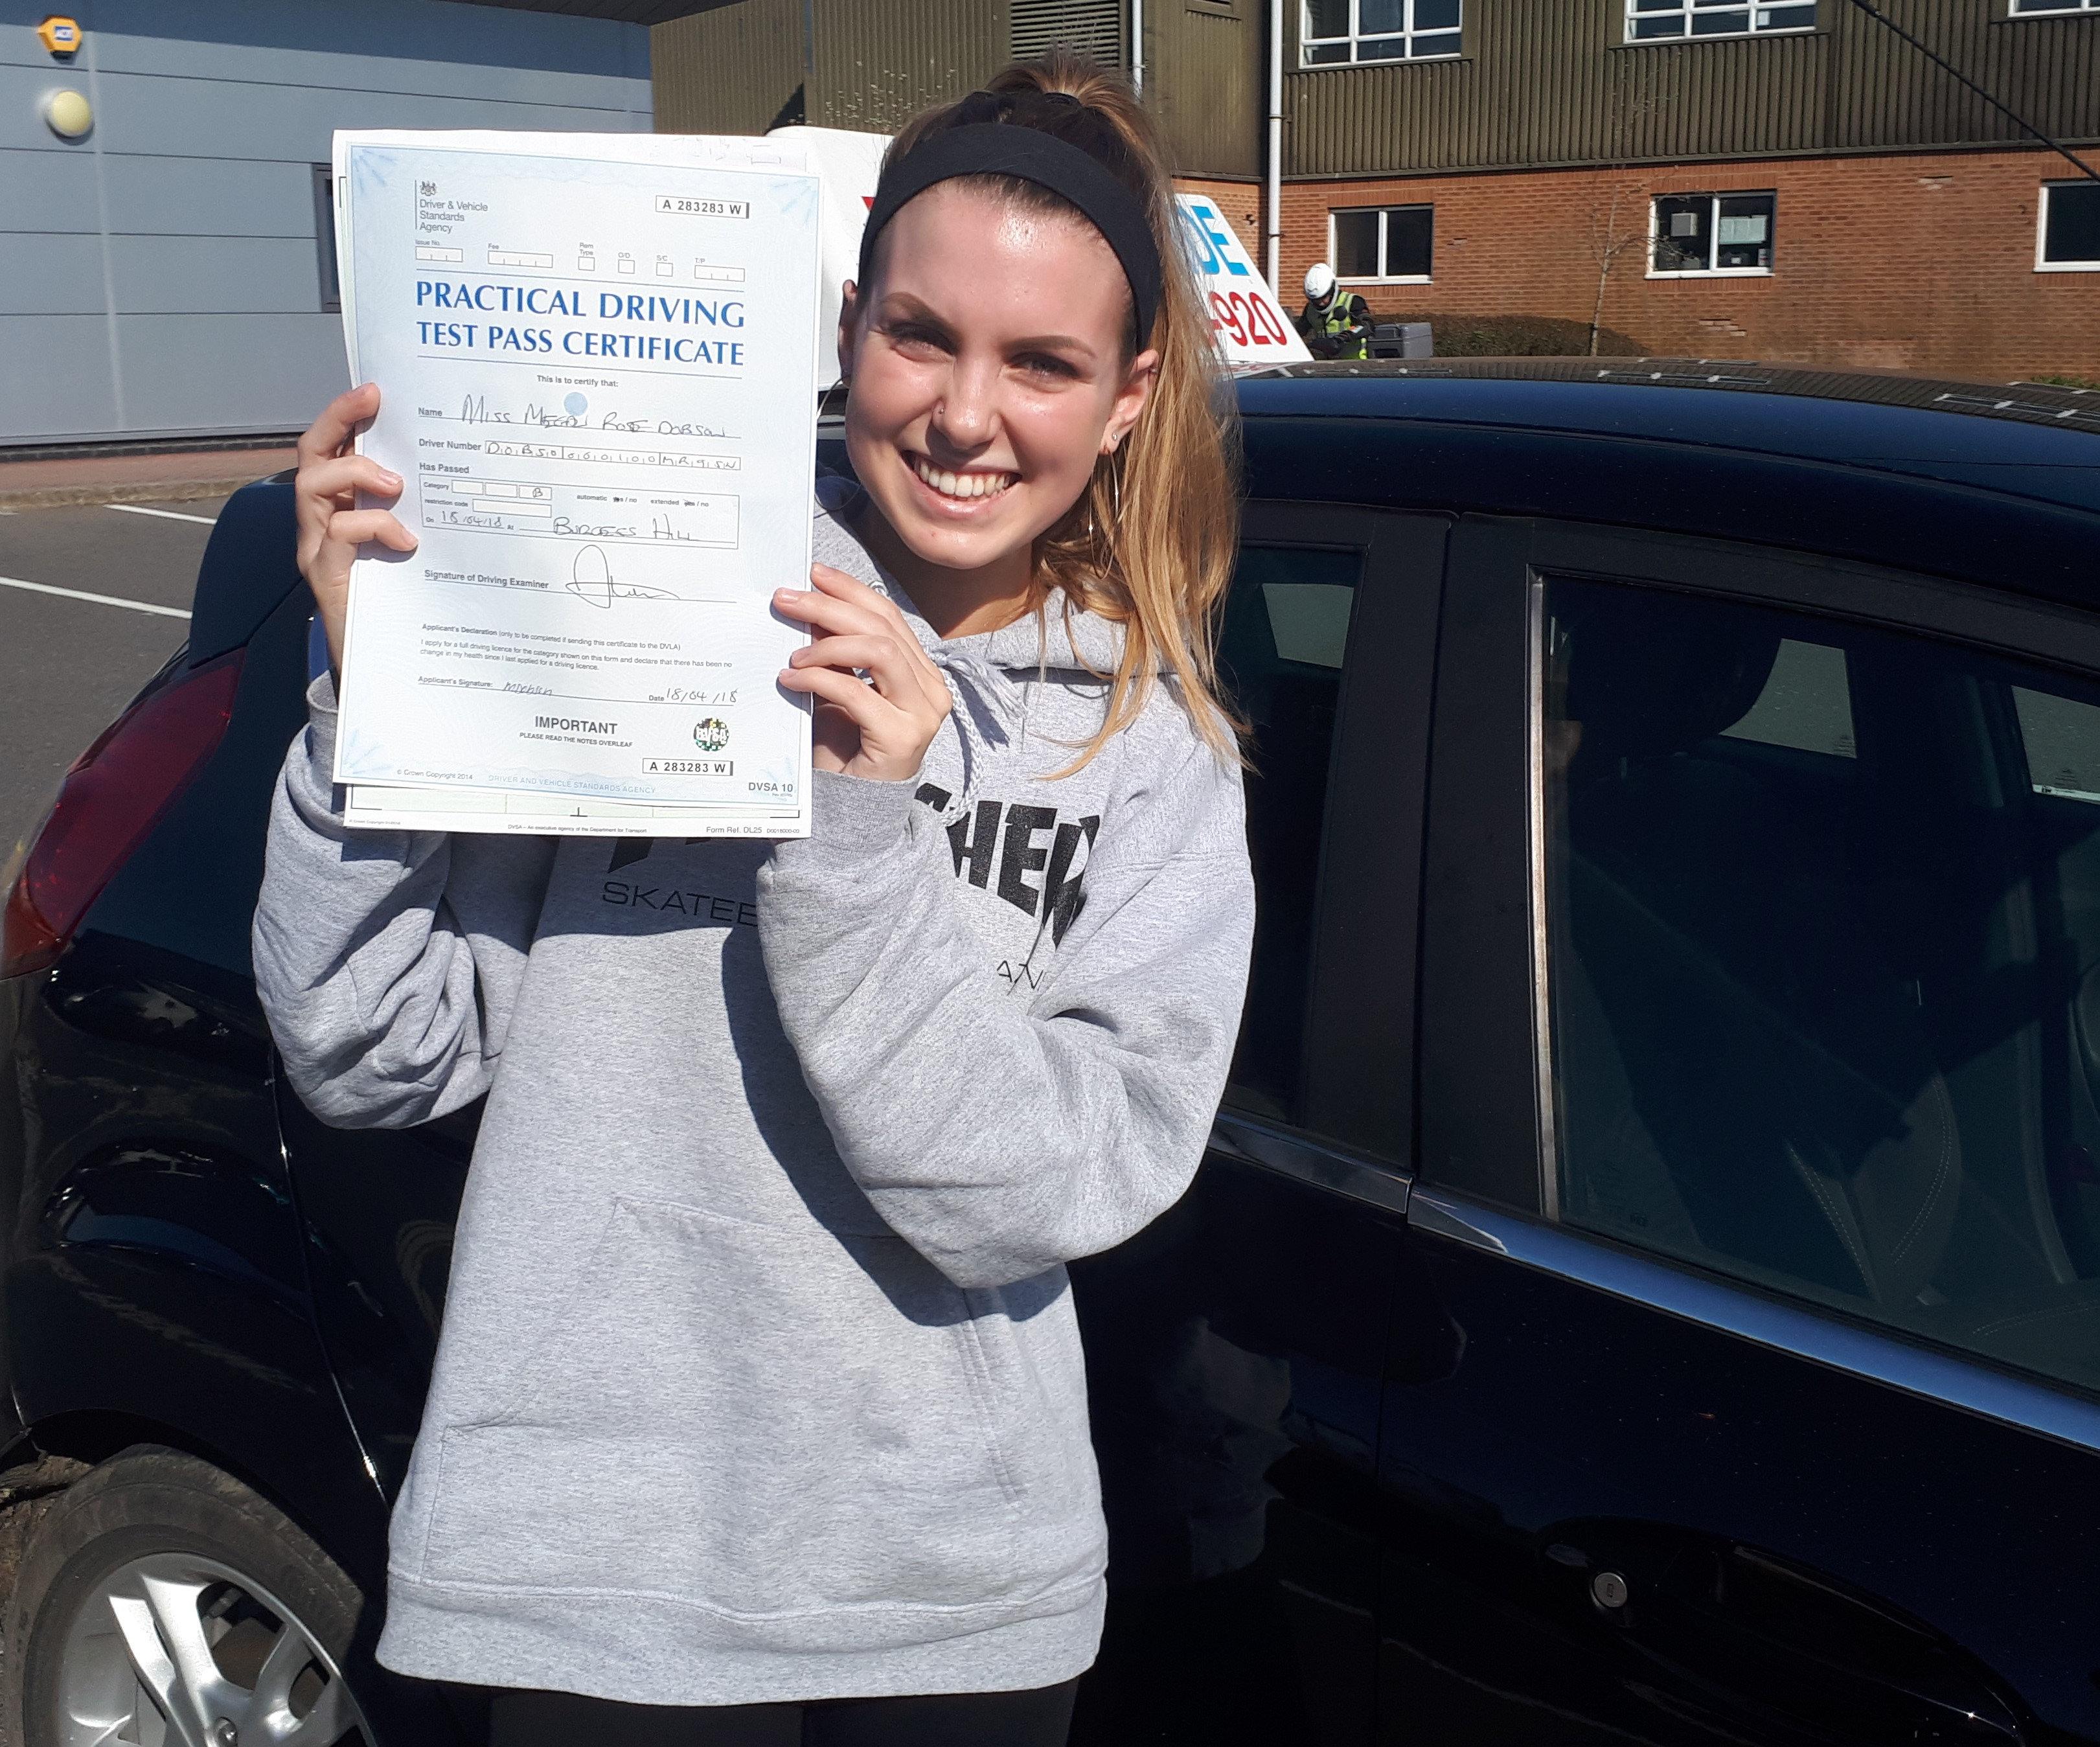 Megan passed